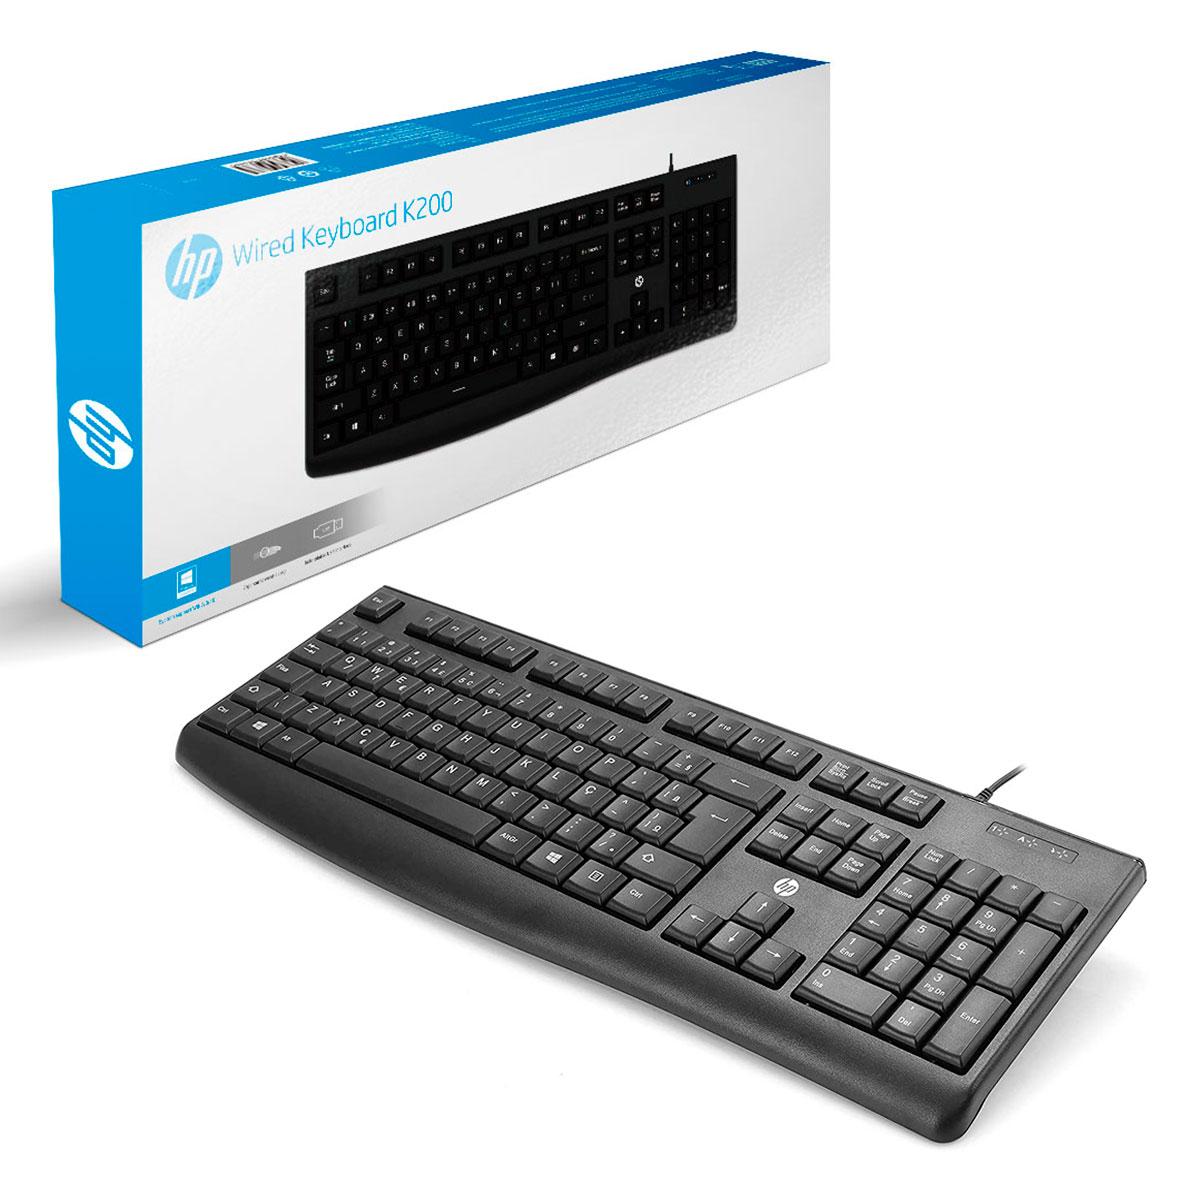 Teclado HP K200, USB, ABNT2, Preto